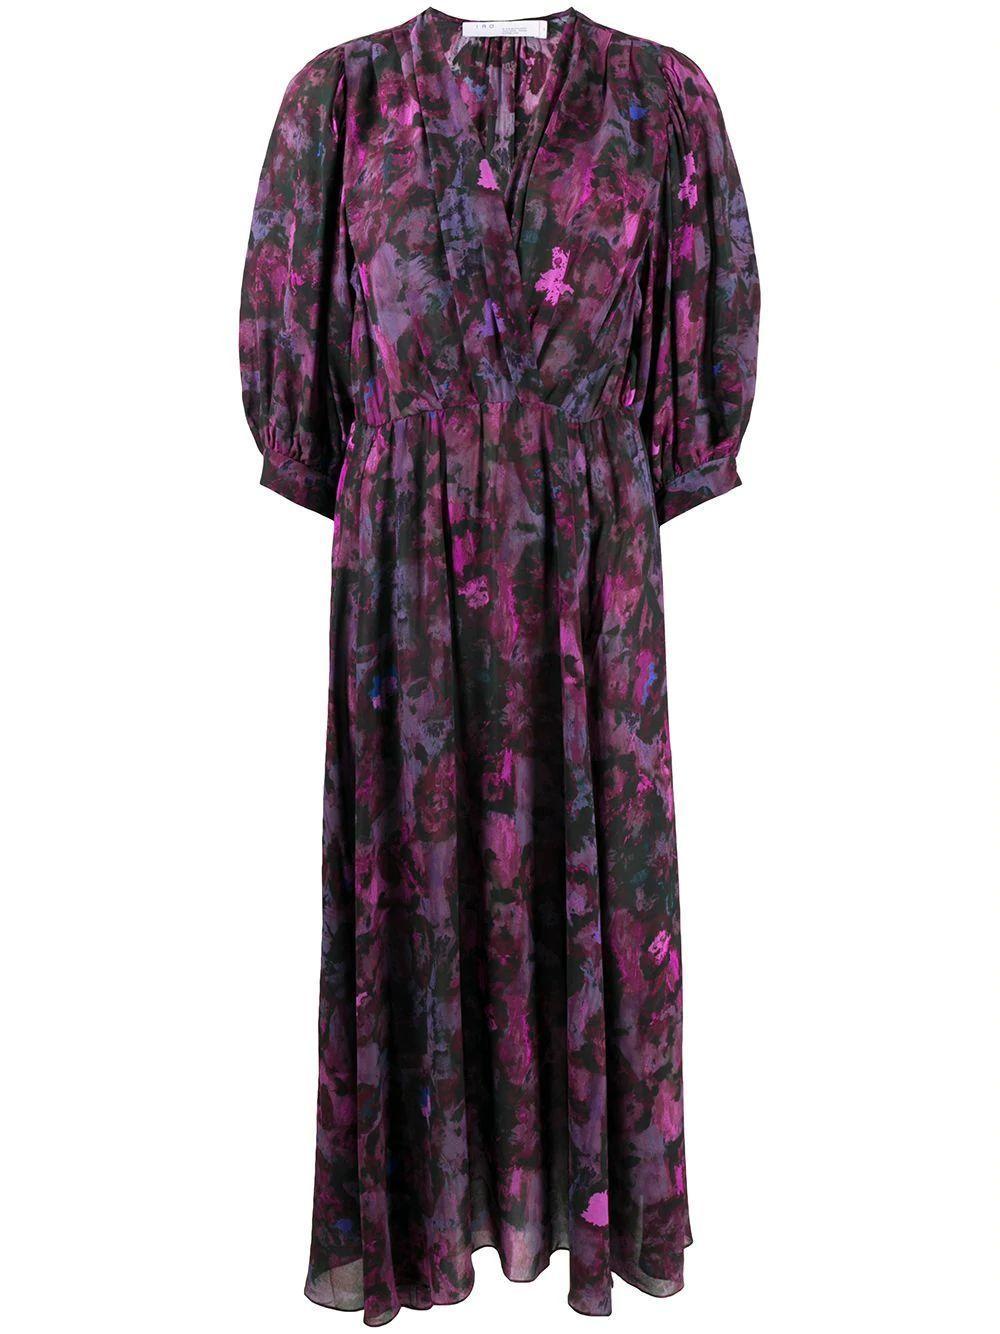 Each Dress Item # WP33EACH-C